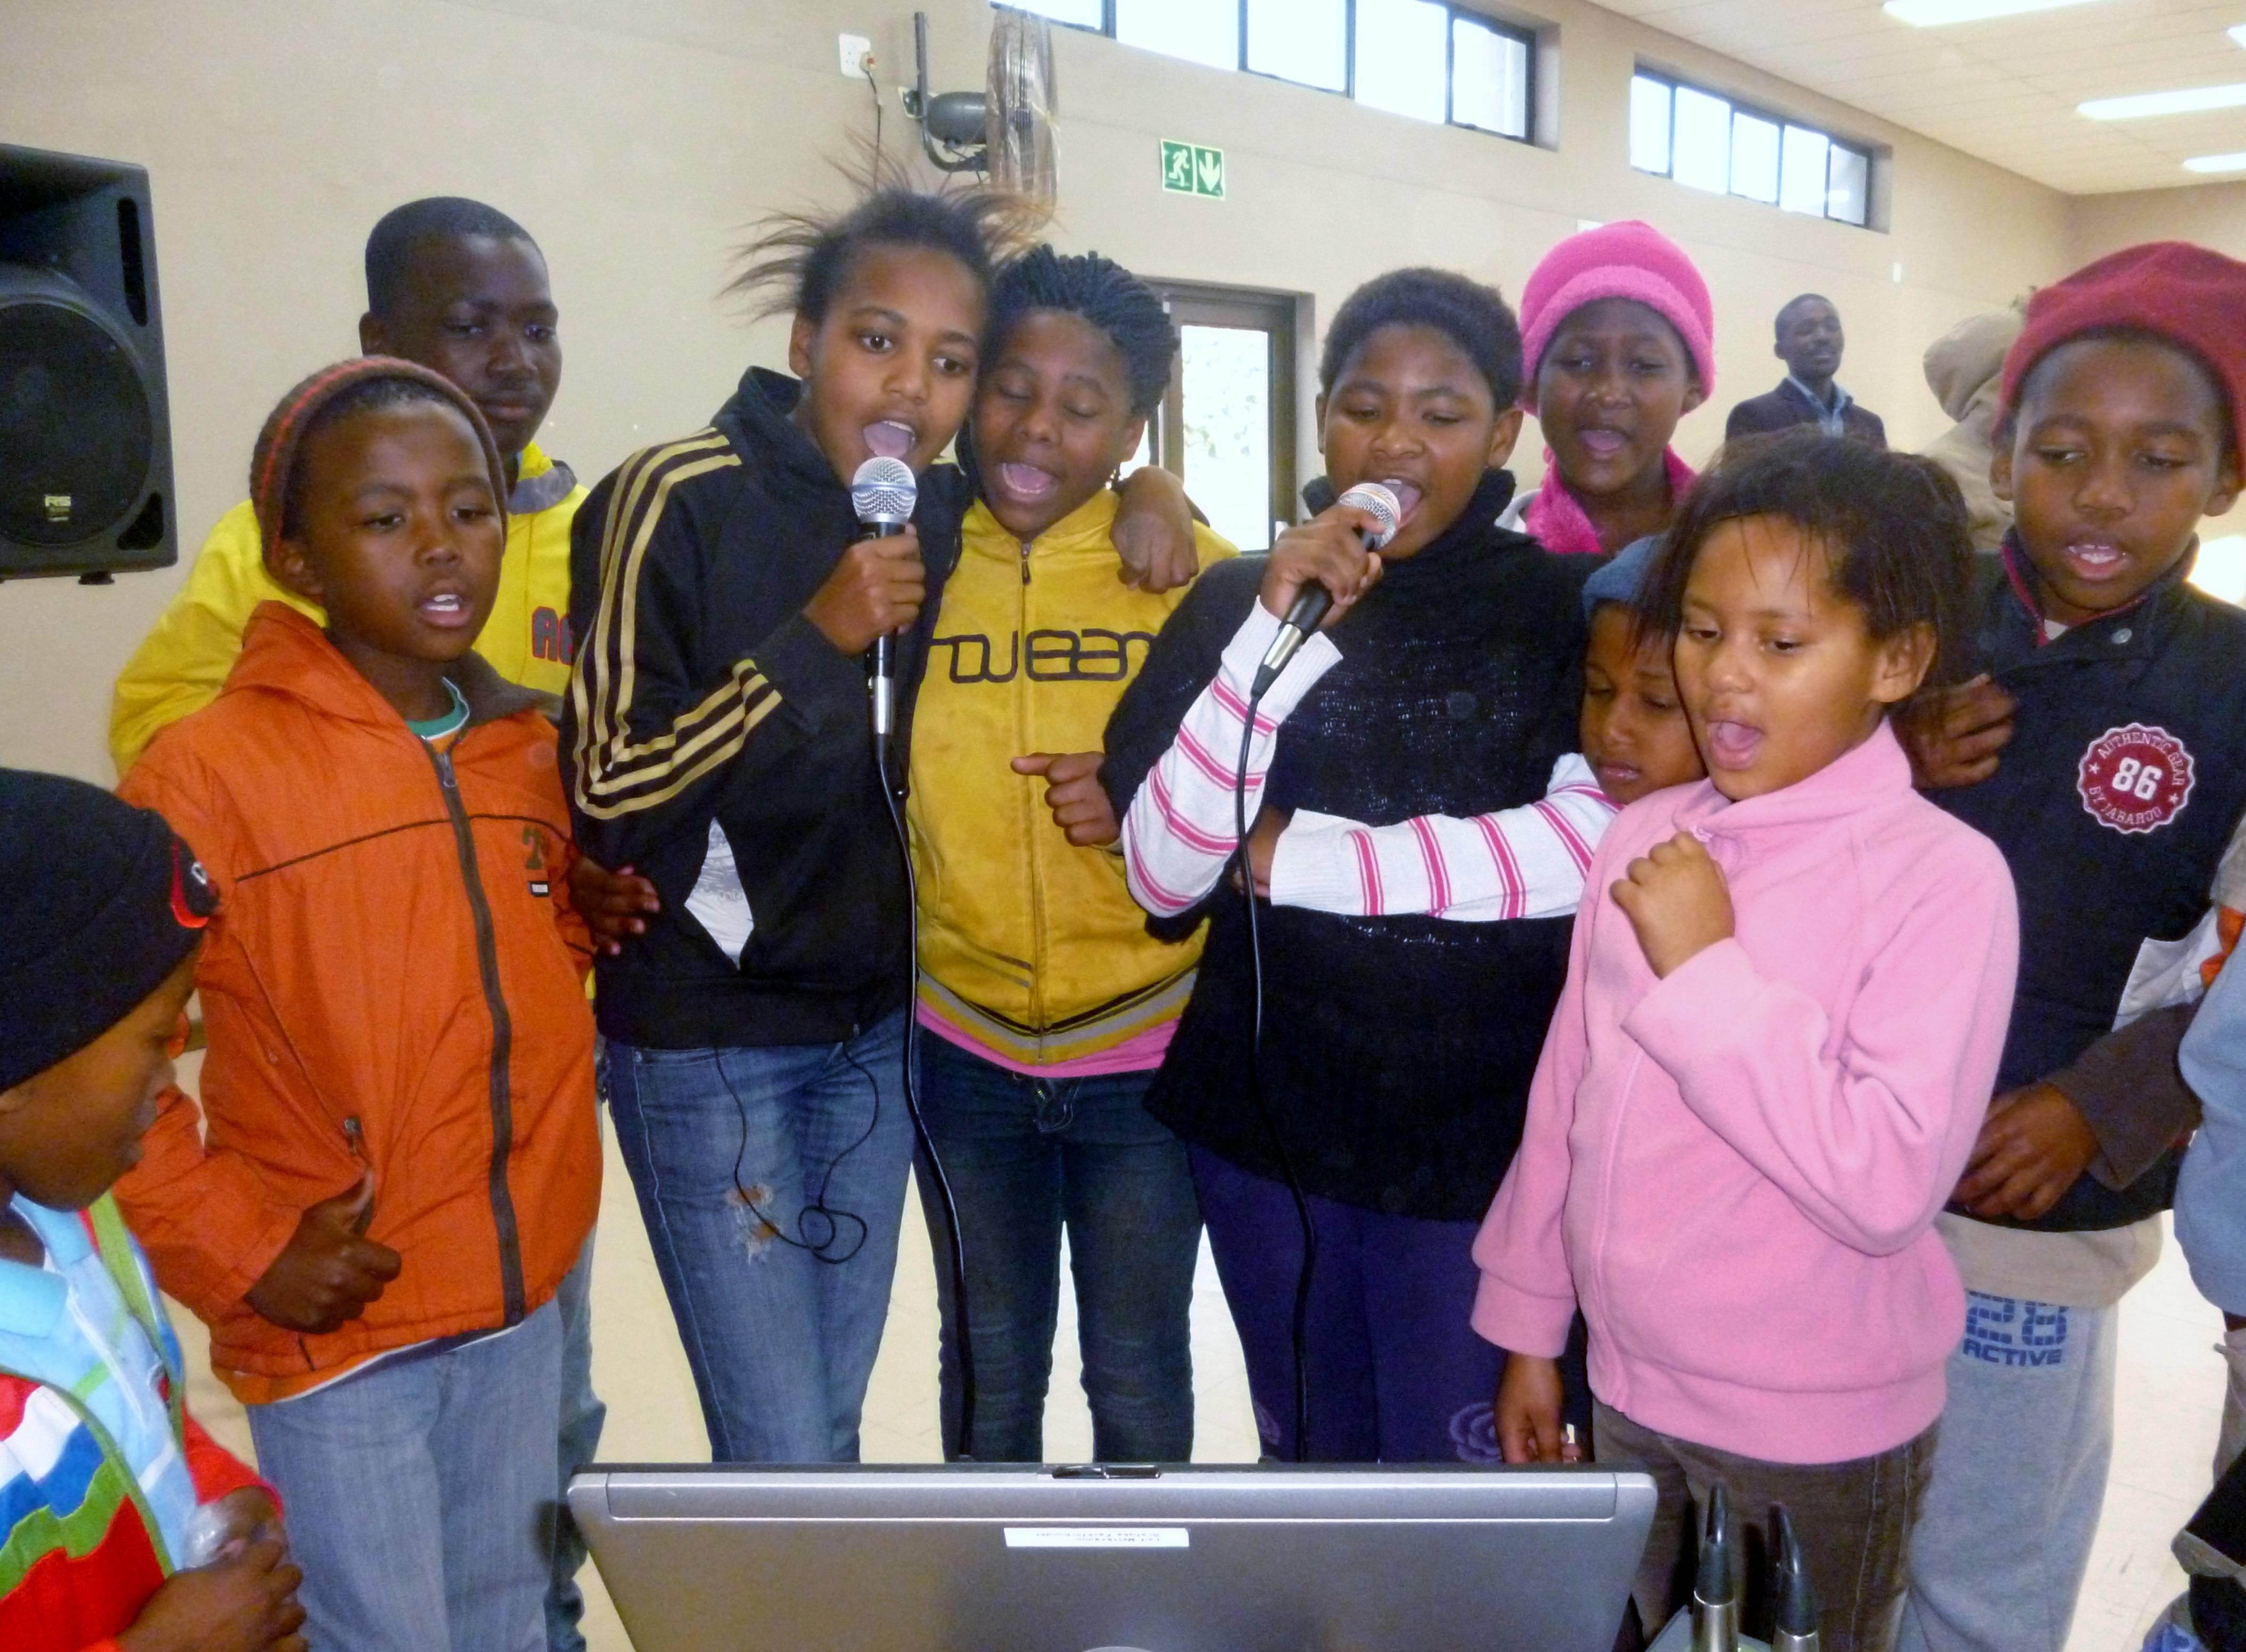 children's event